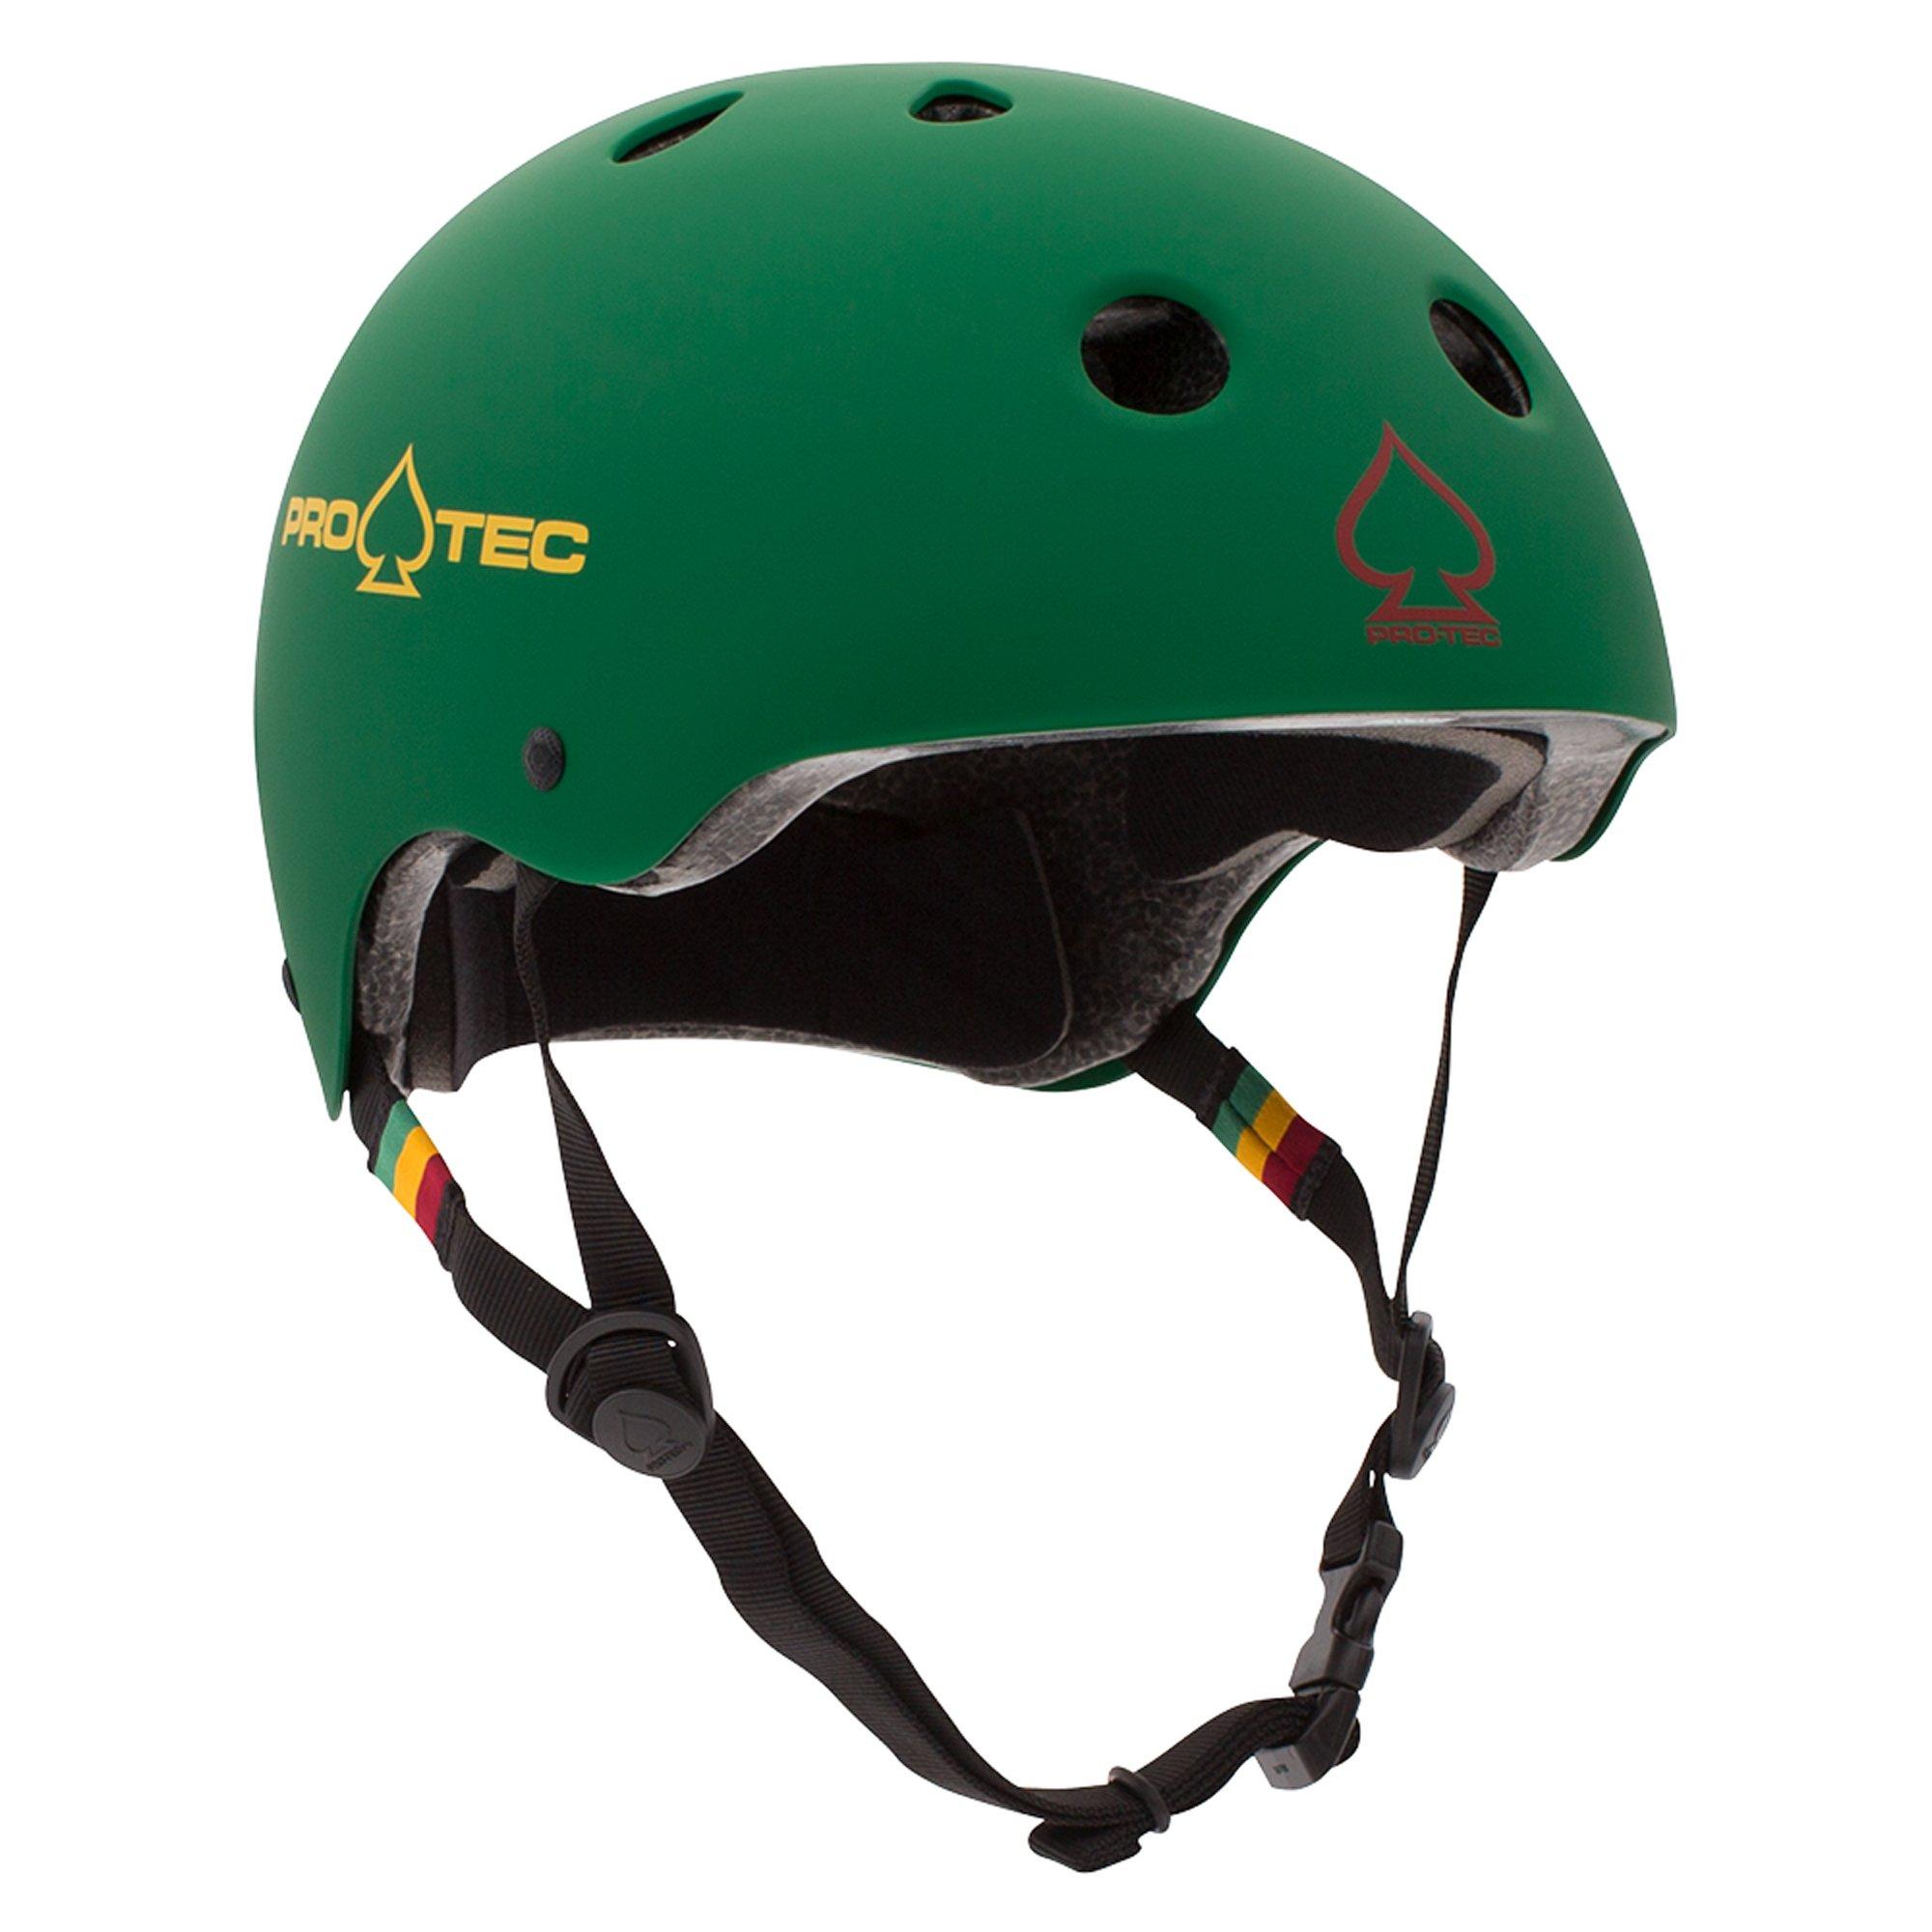 Pro-Tec PROTEC Original Classic Helmet CPSC-Certified, Matte Rasta Green, X-Small